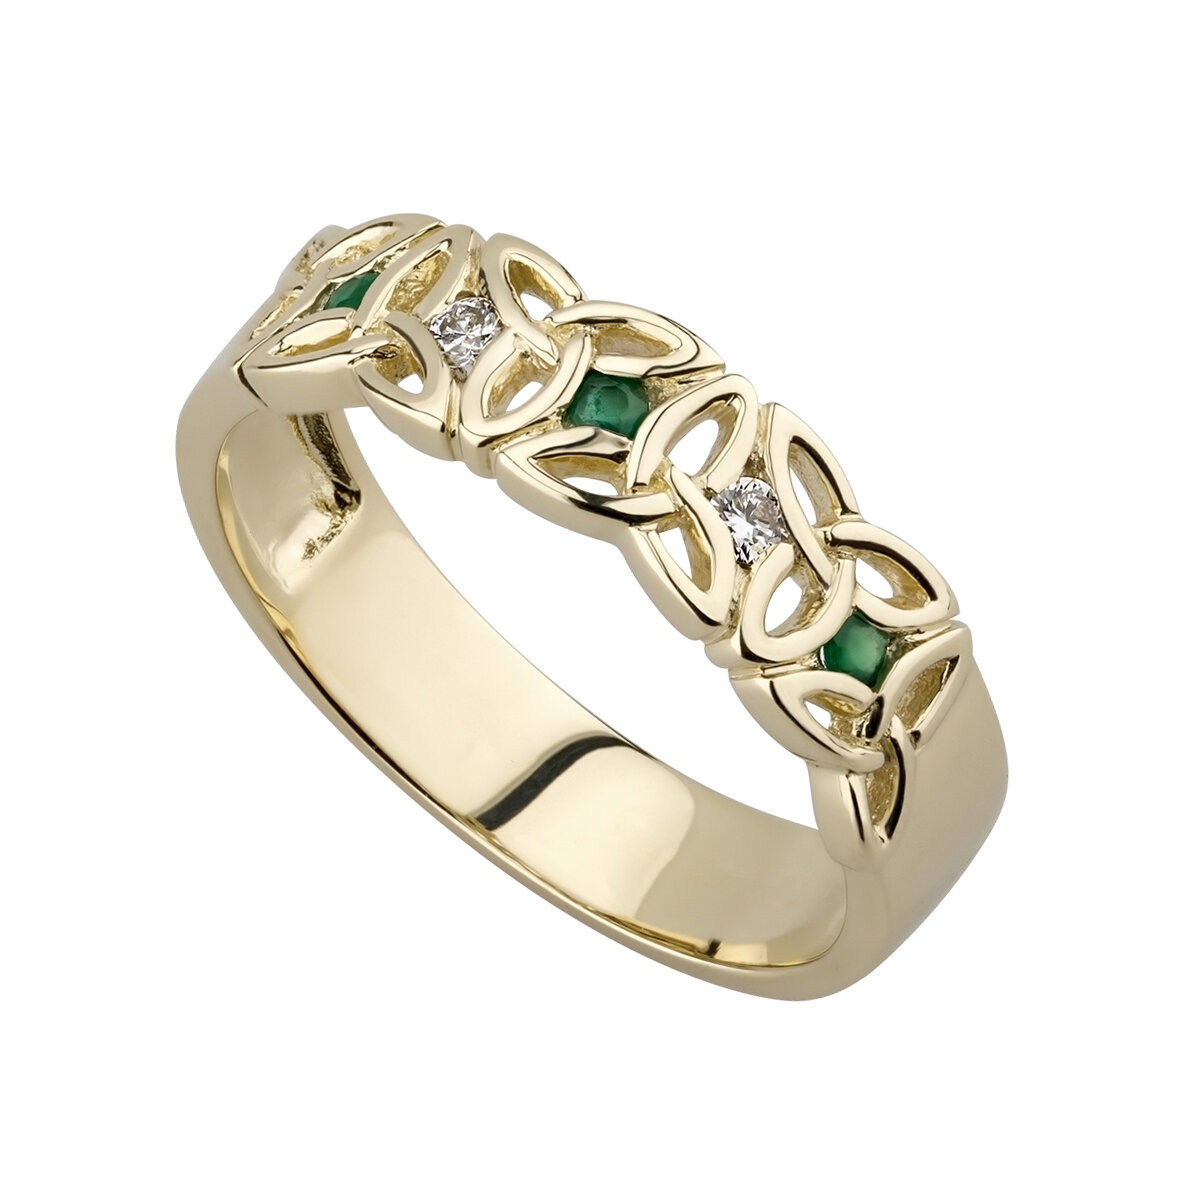 nine karat Gold Emerald And Cubic Zirconia Trinity Knot Ring S2630 from Solvar Jewellers, Ireland